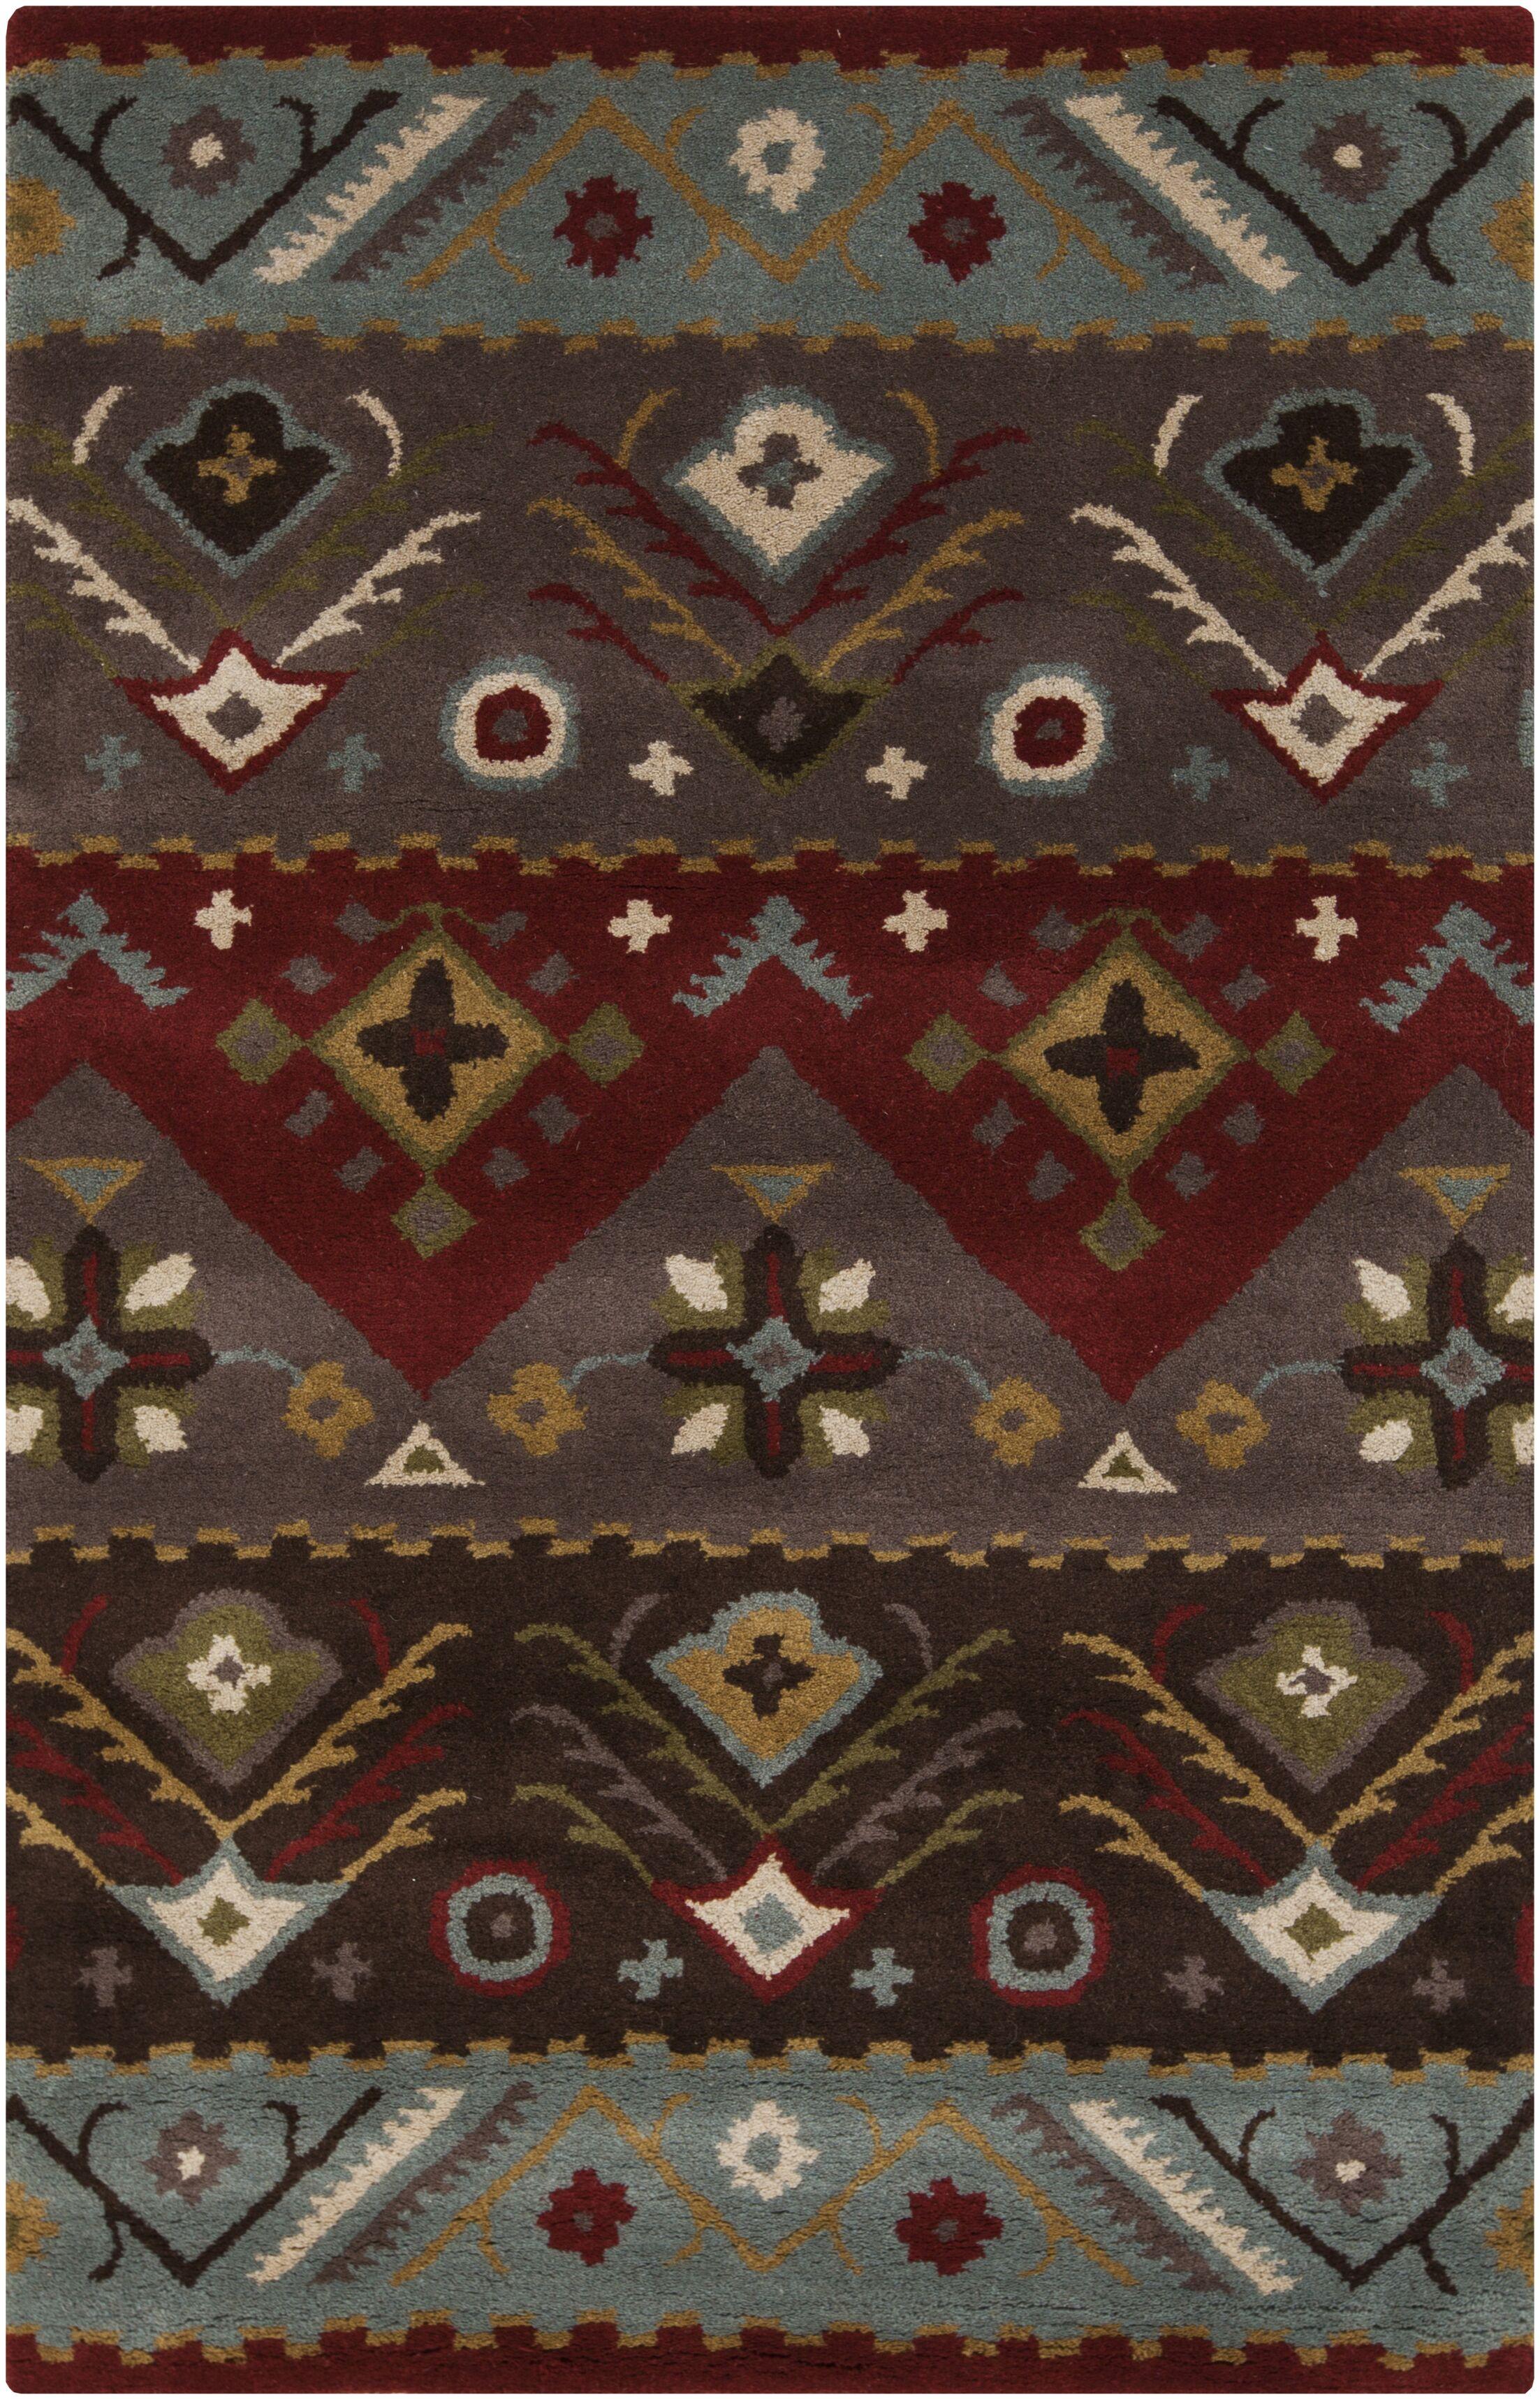 Co Bohemian Hand-Tufted Garnet/Plum Area Rug Rug Size: Rectangle 3'6